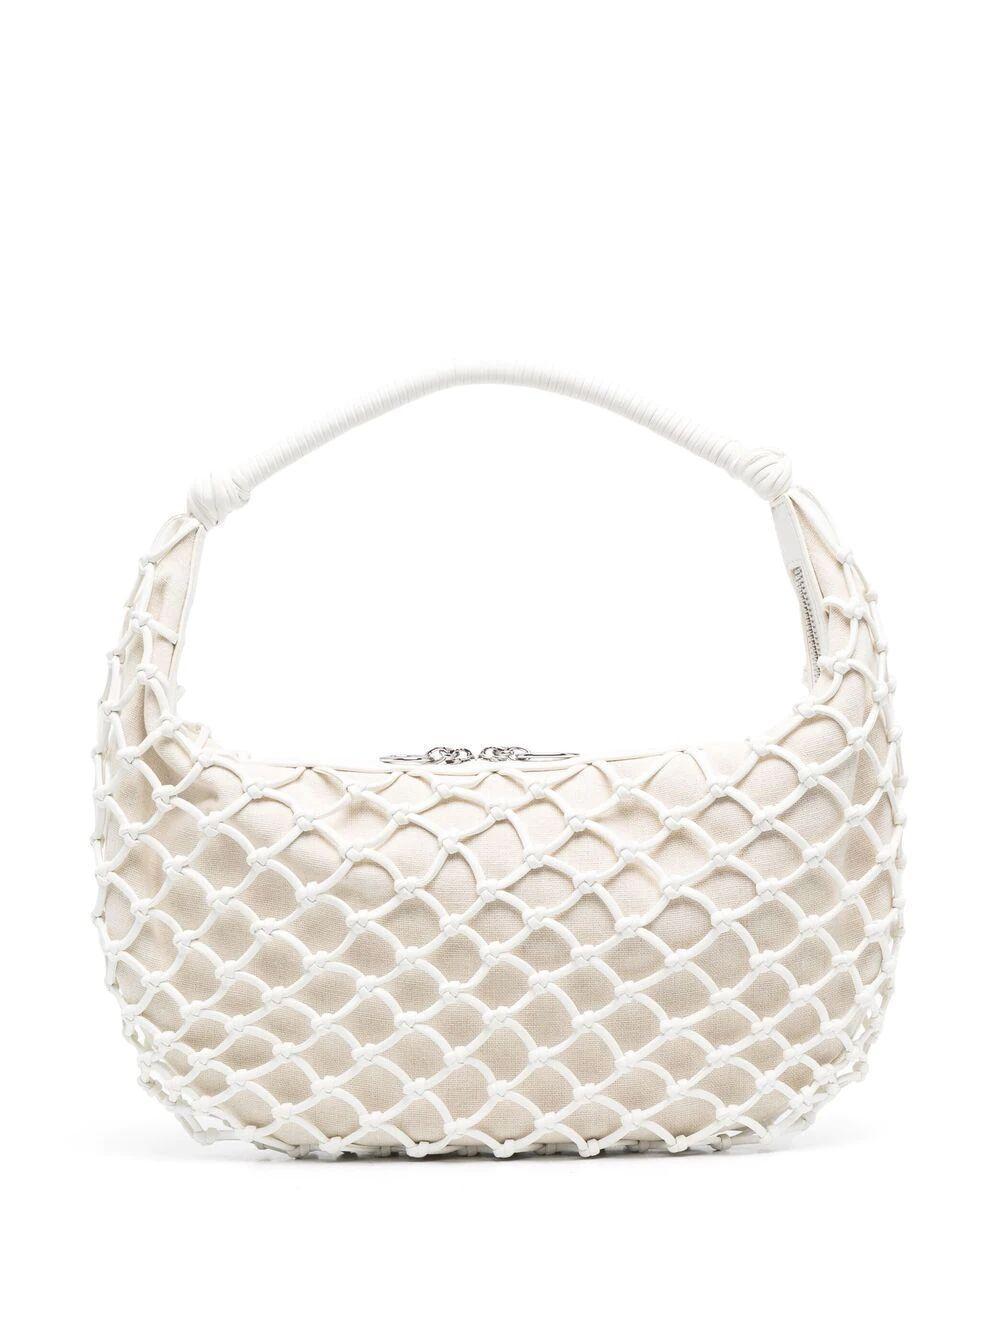 Luna Bag Item # 306-9365